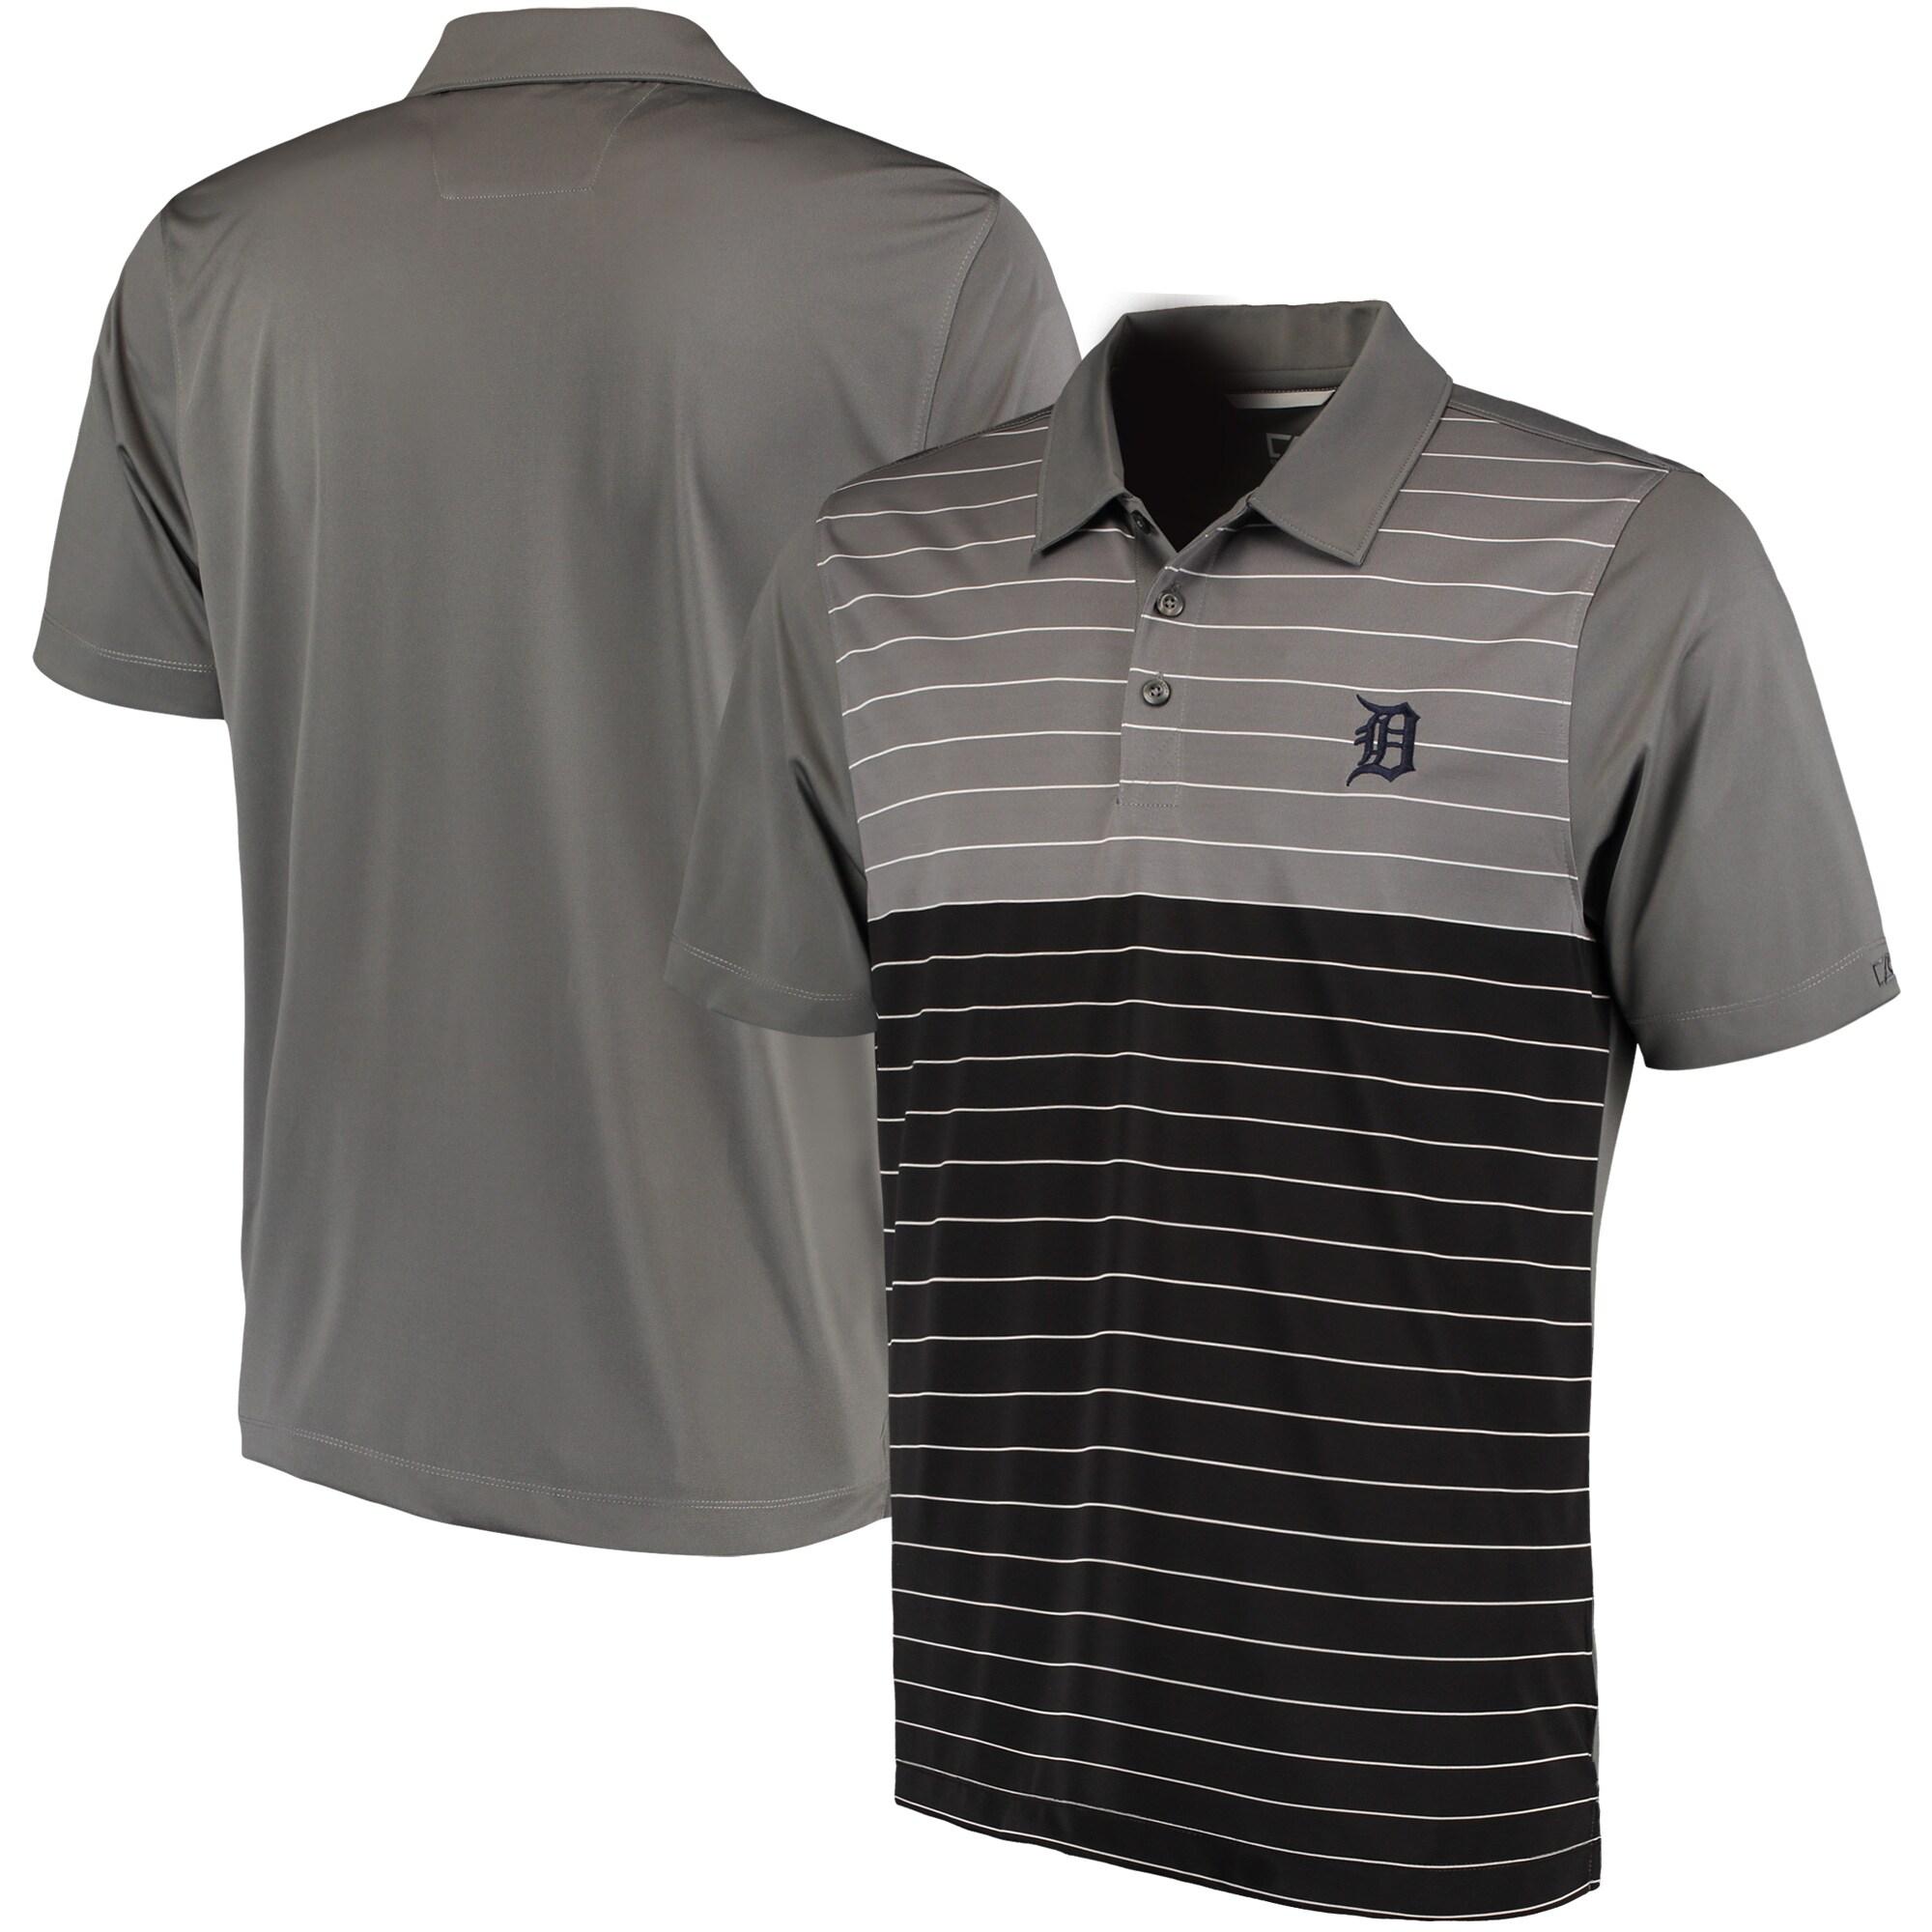 Detroit Tigers Cutter & Buck Endeavor Stripe DryTec Polo - Gray/Black